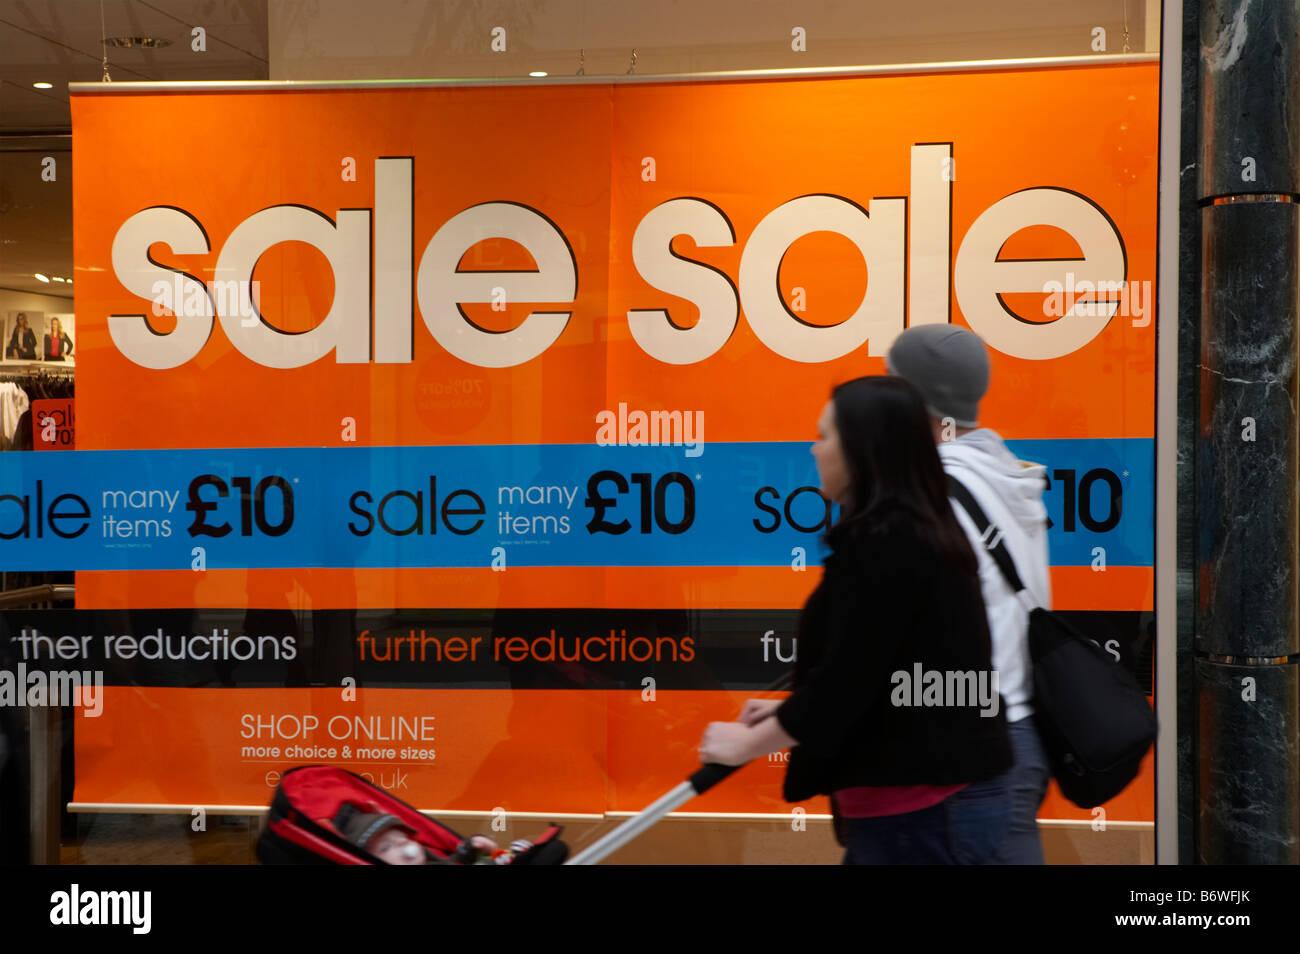 SHOP WINDOW SALE SALES SIGN PRICE REDUCTION SAVE SAVING MONEY CHRISTMAS JANUARY - Stock Image